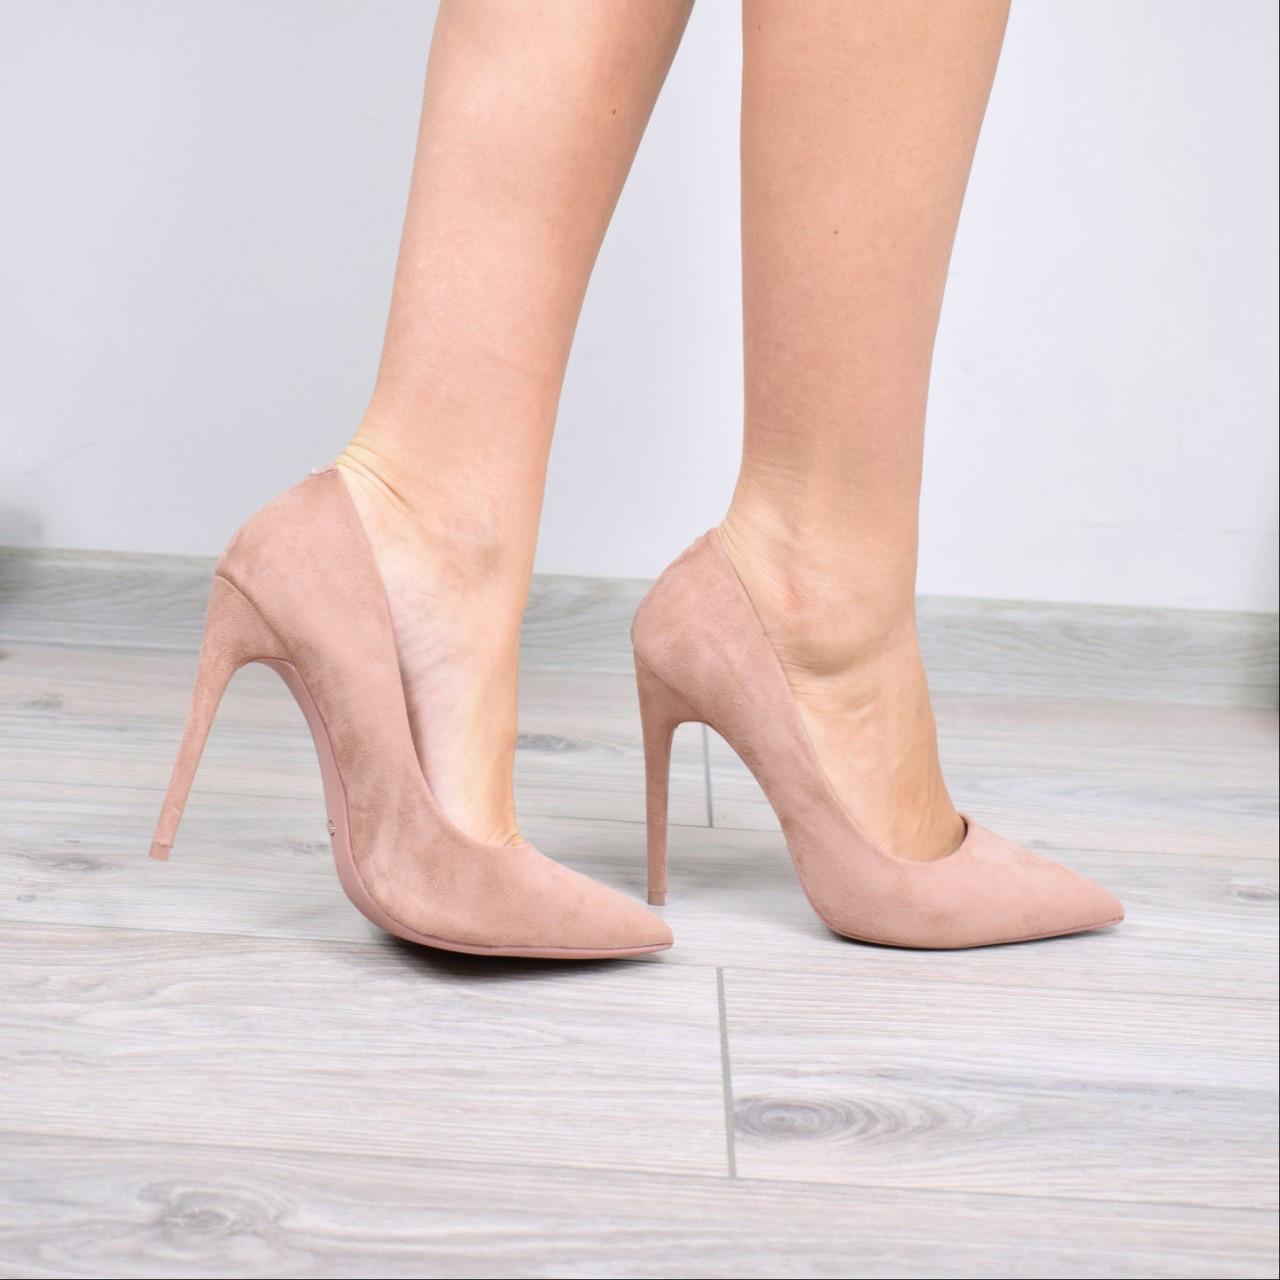 Туфли женские на шпильке Vices So Kate бежевая пудра 3615, CHRISTIAN  LOUBOUTIN b4aeb38a625